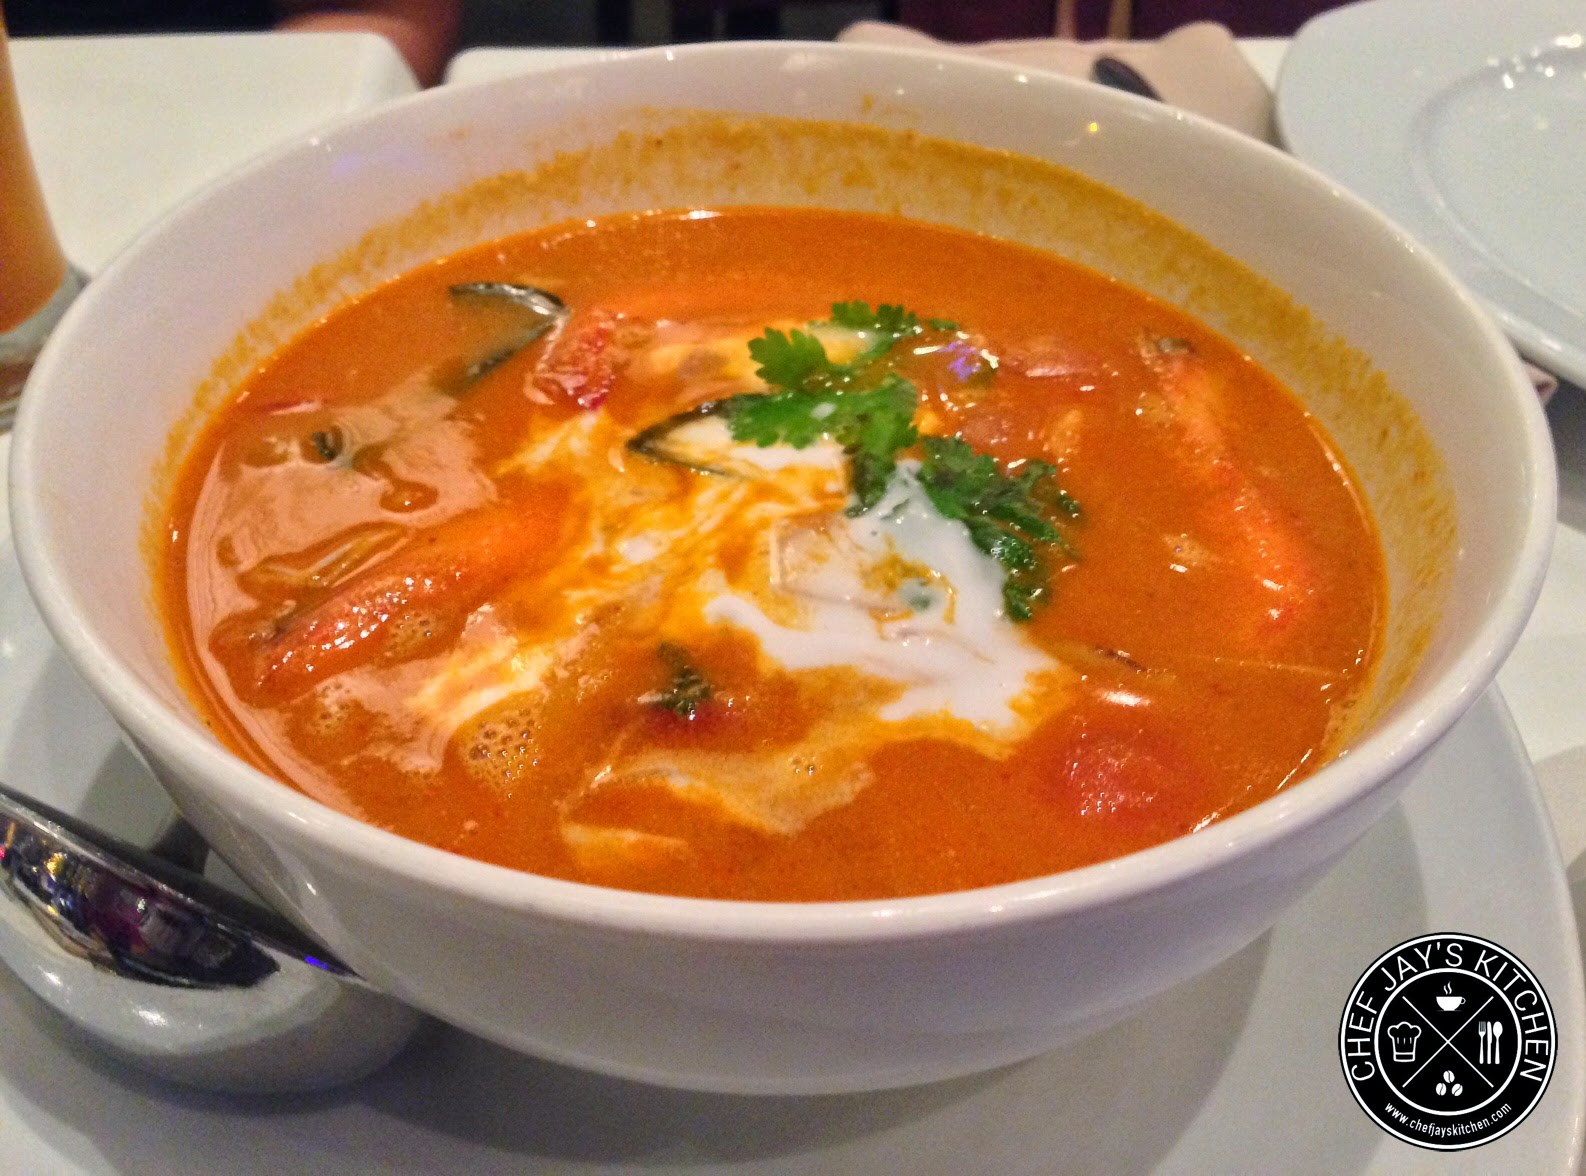 Silk Road Thai Restaurant - Tom Yum